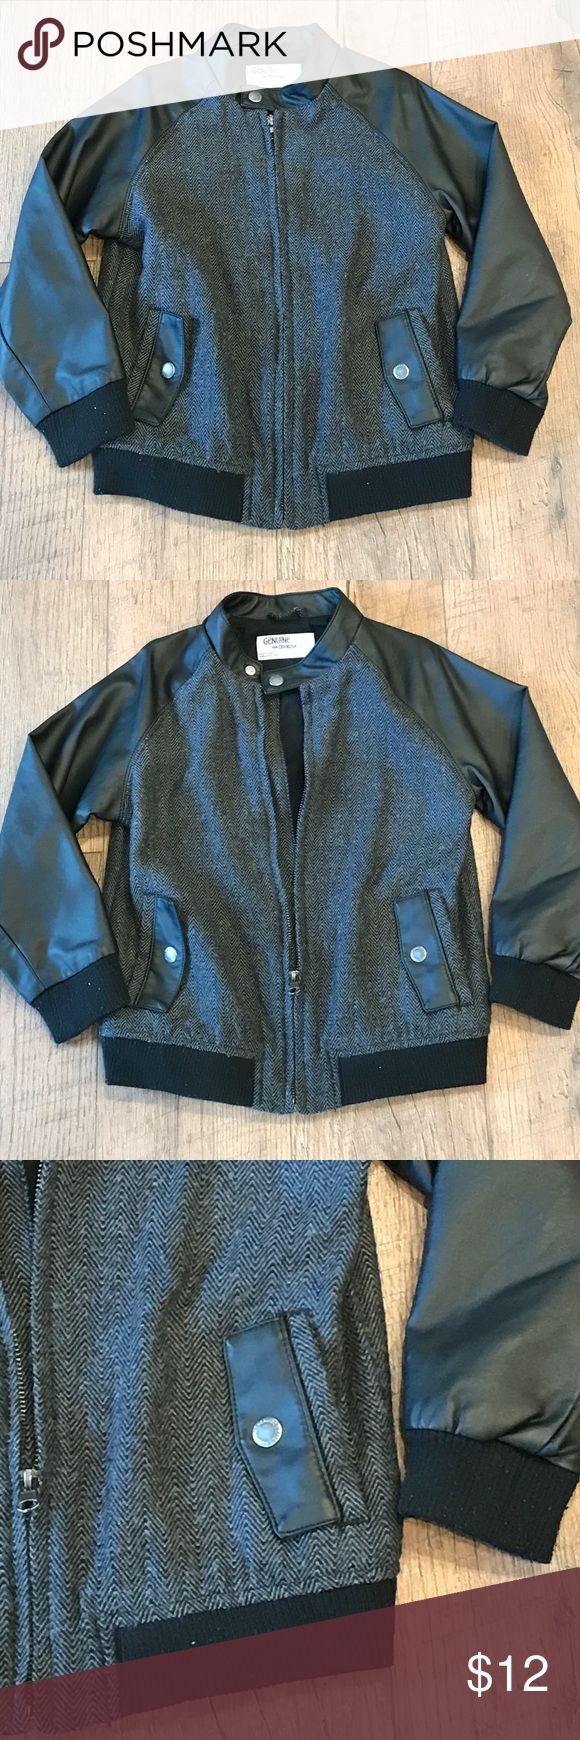 Genuine kids faux leather and herringbone jacket Genuine kids from Oshkosh faux leather and herringbone tweed jacket. Super adorable on your little man! genuine kids Jackets & Coats